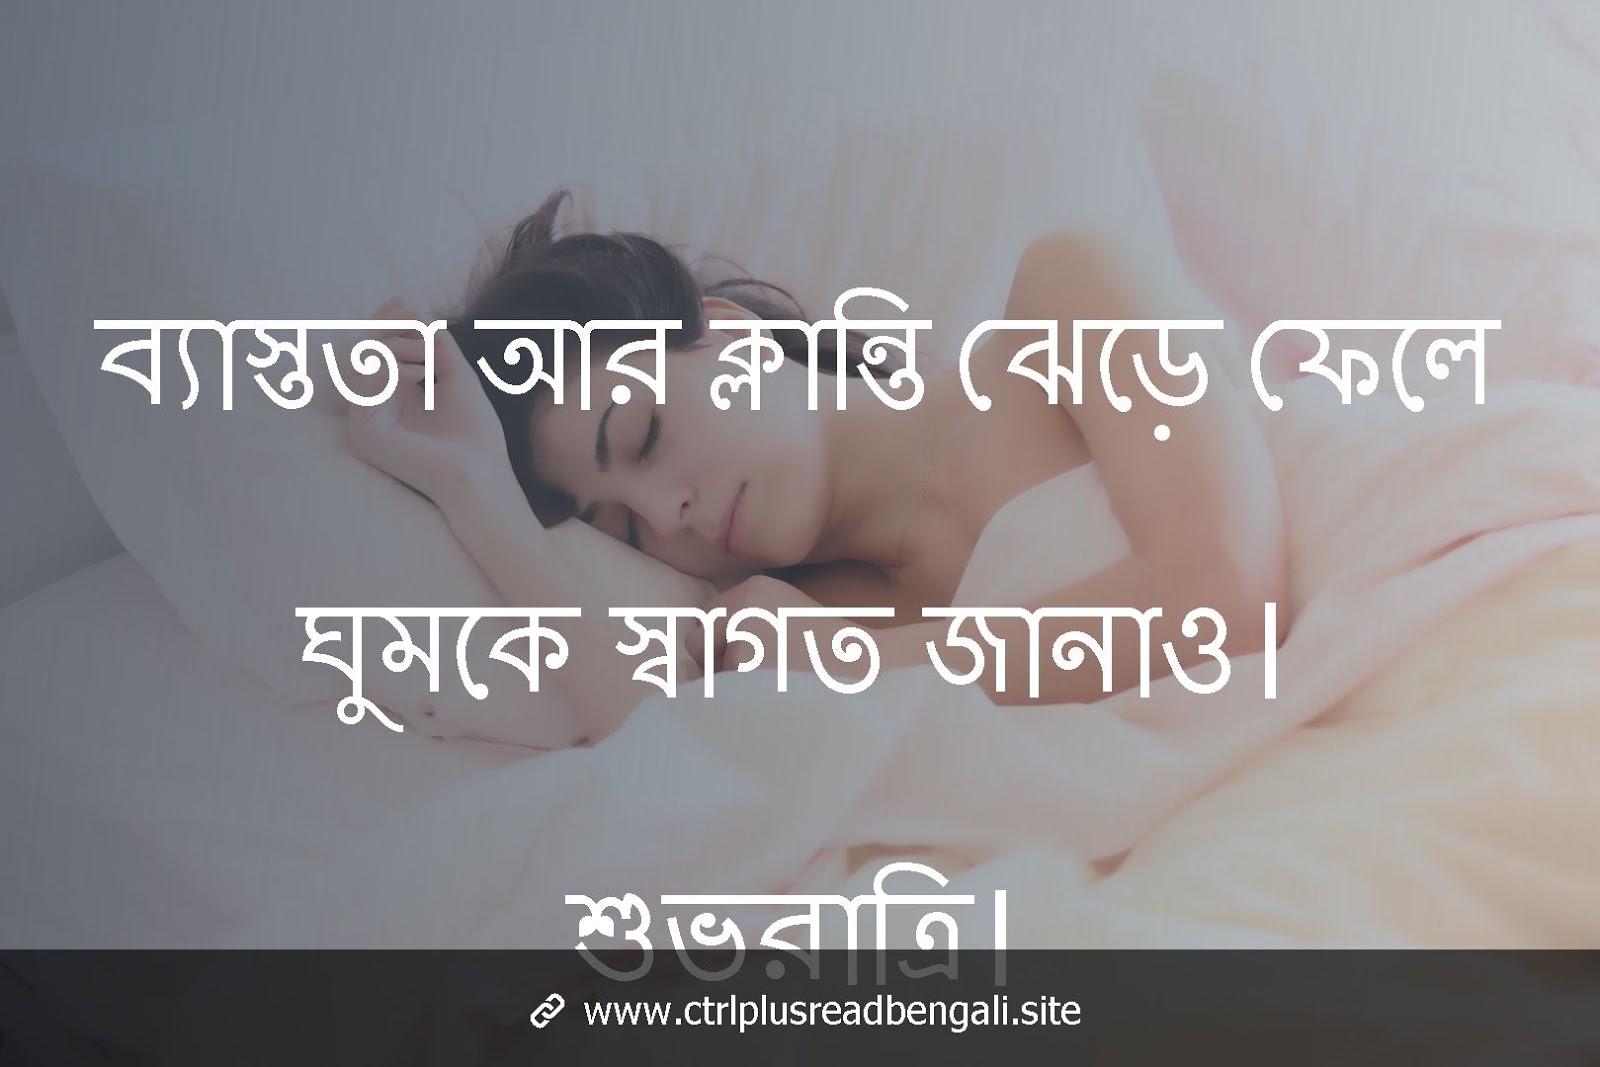 Good night quote In Bengali